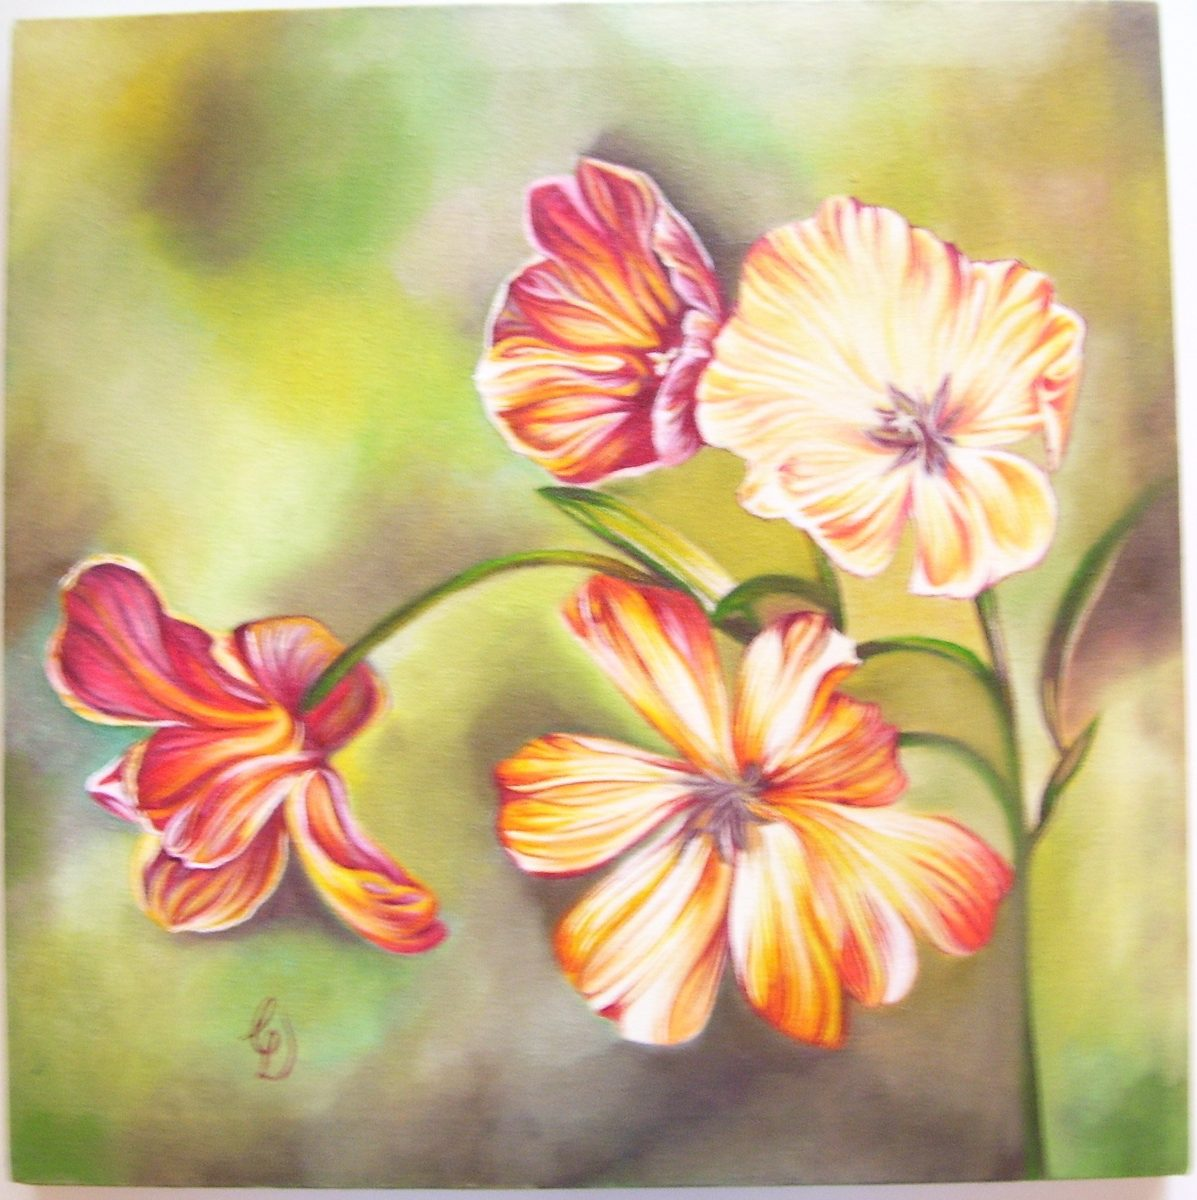 cuadro flores sobre bastidor decoracin amapolas lilium